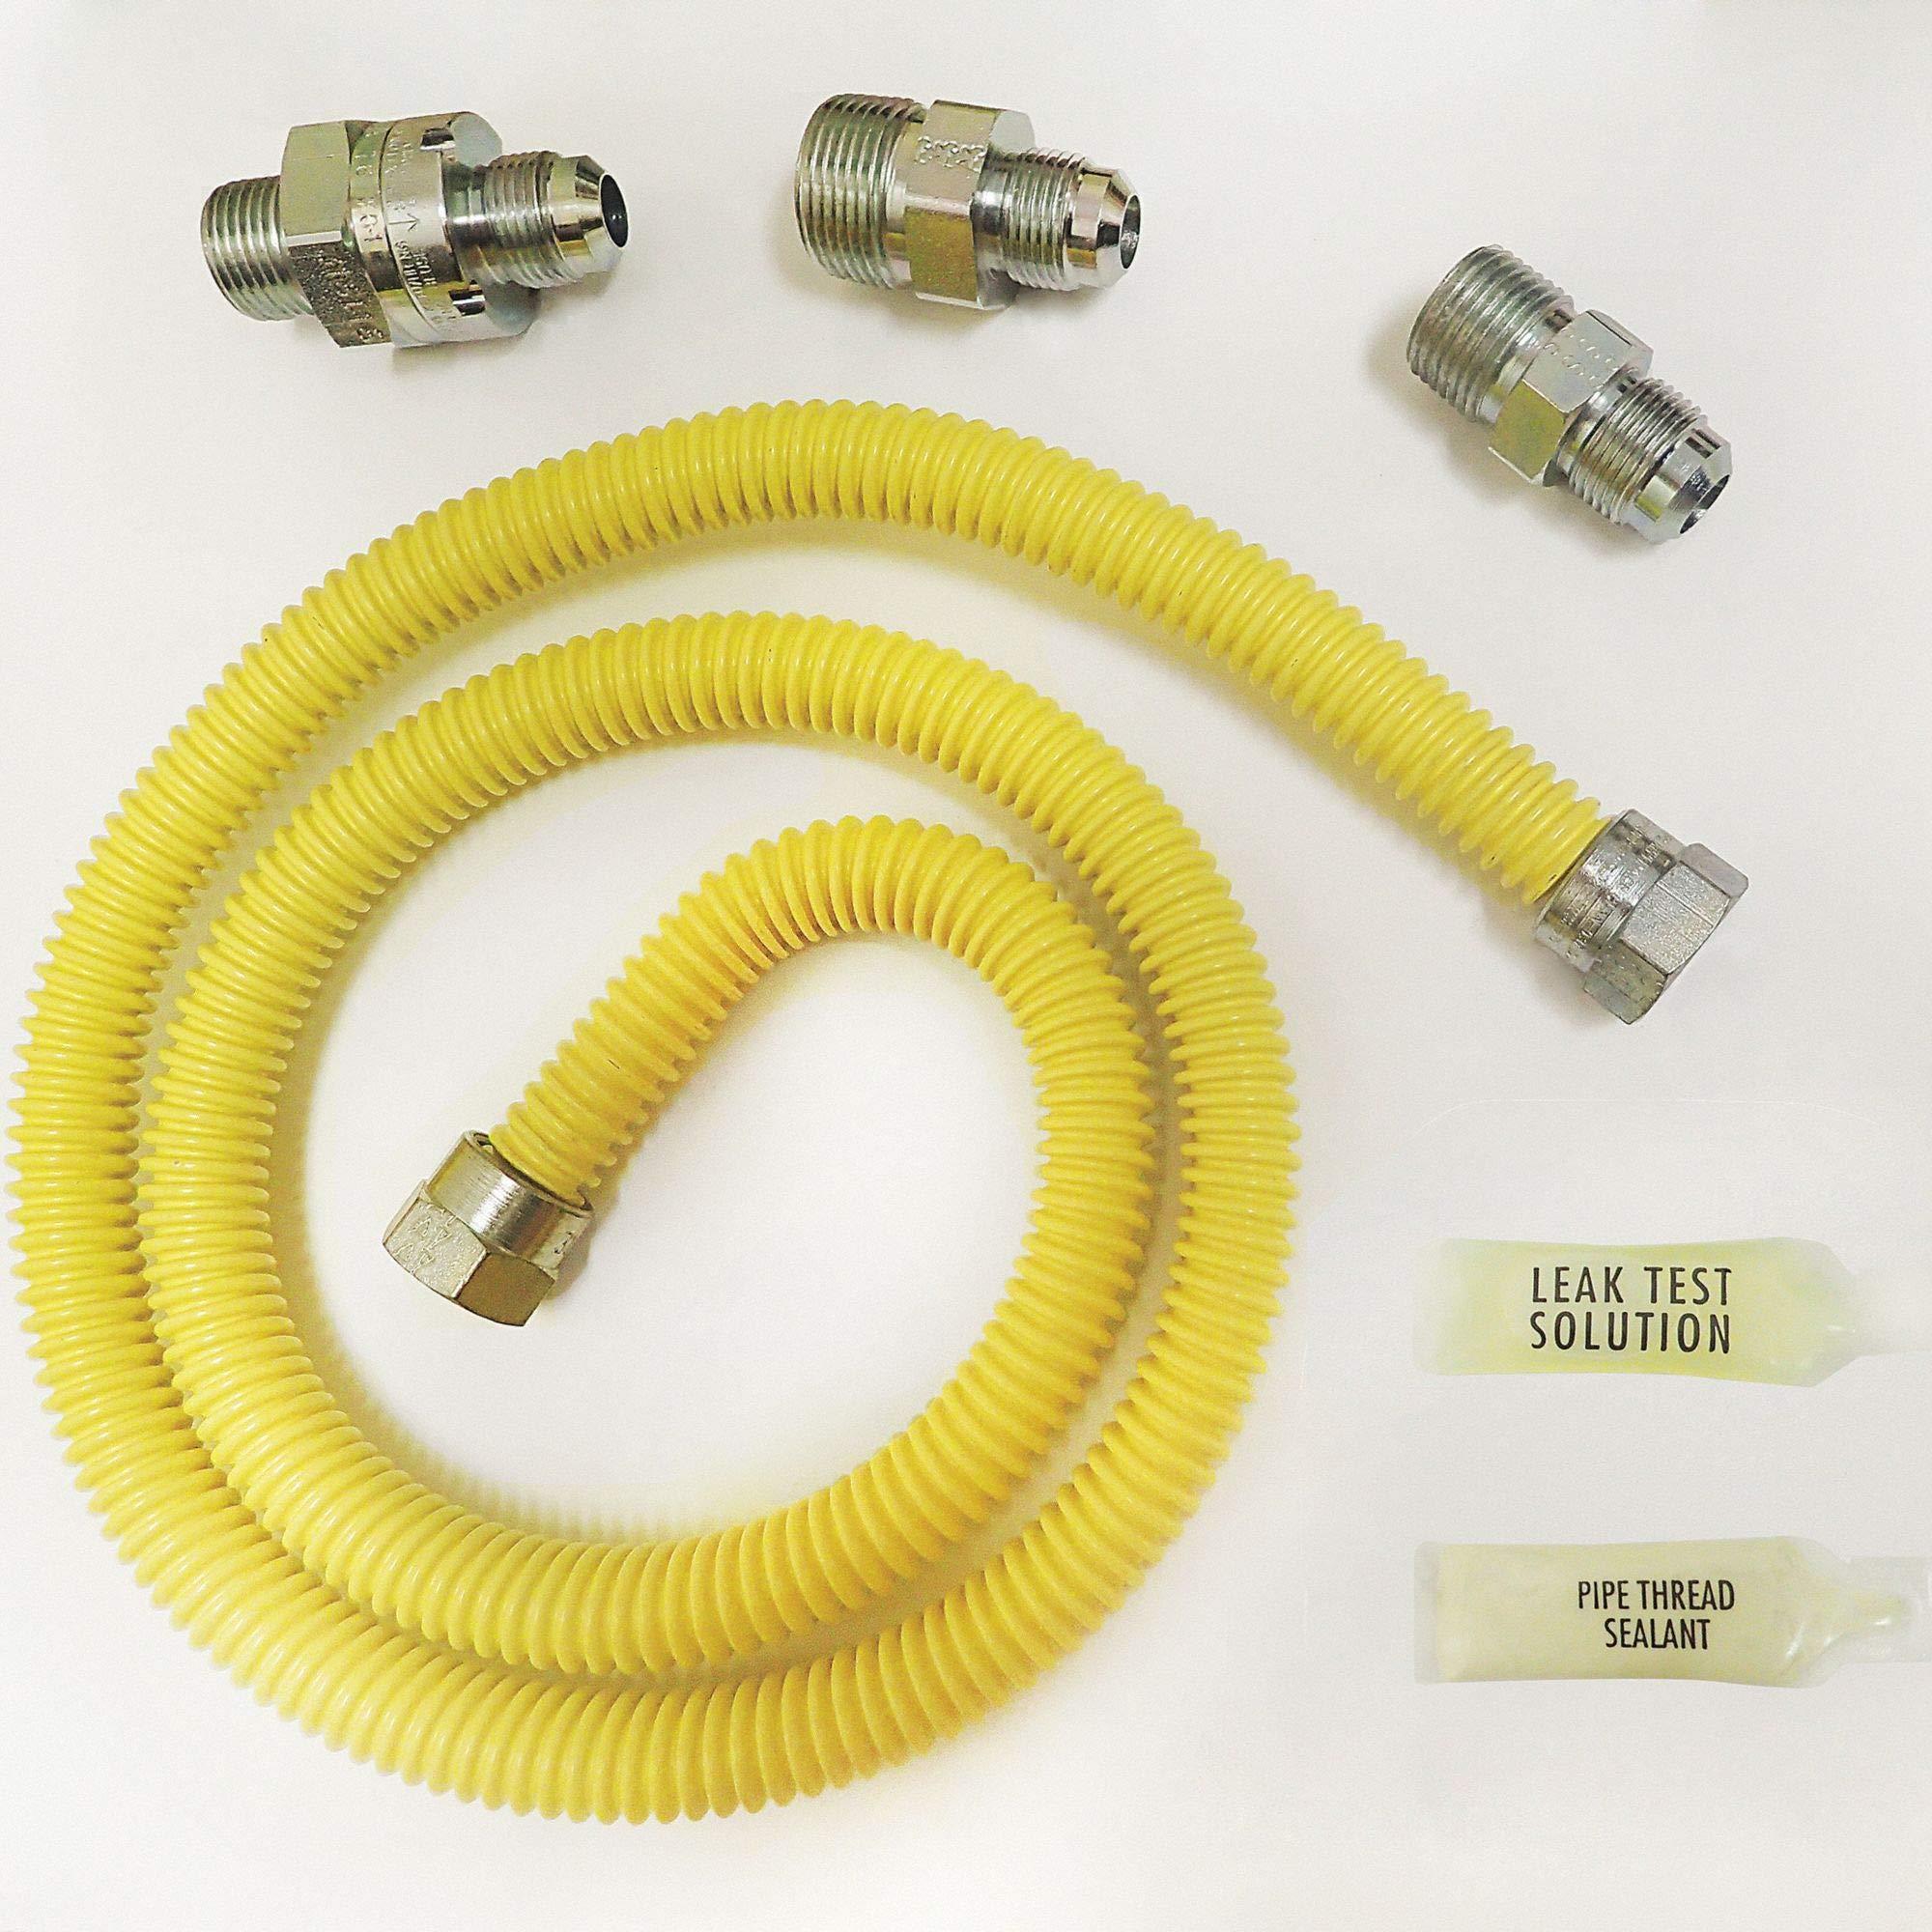 Gas Flow Valve Kit, Stainless Steel, 48''L x 1/2''